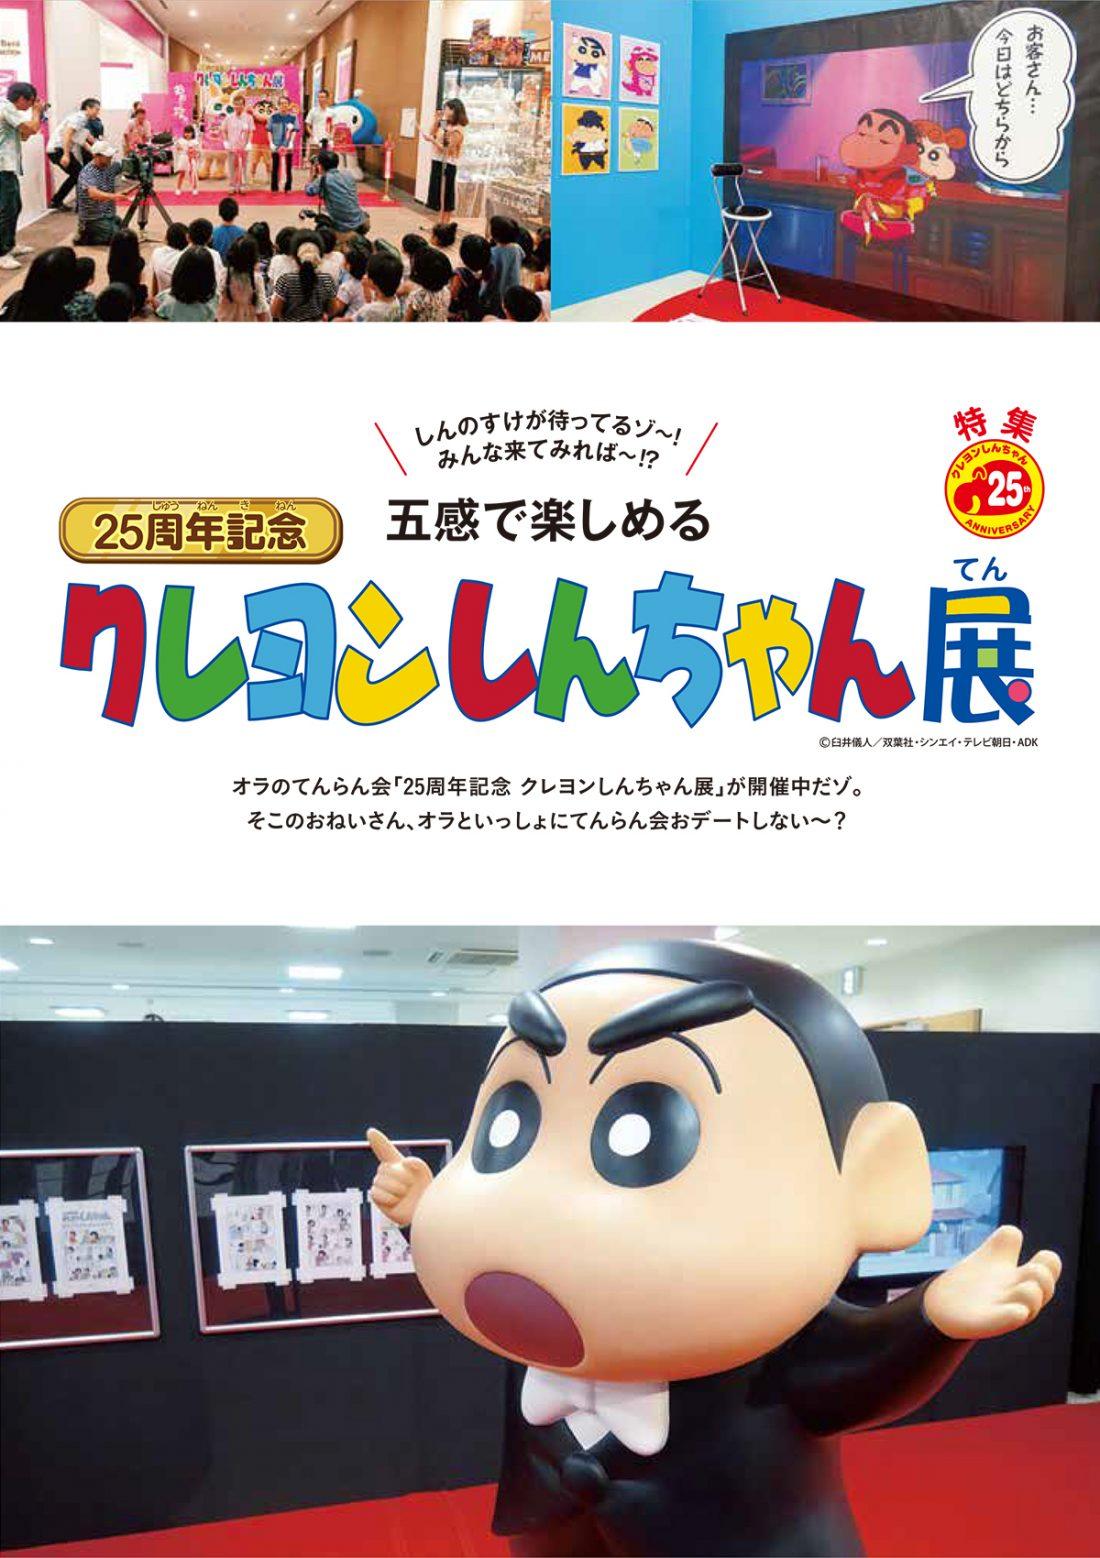 https://www.qab.co.jp/qgoro/wp-content/uploads/quun_0802-1100x1558.jpg